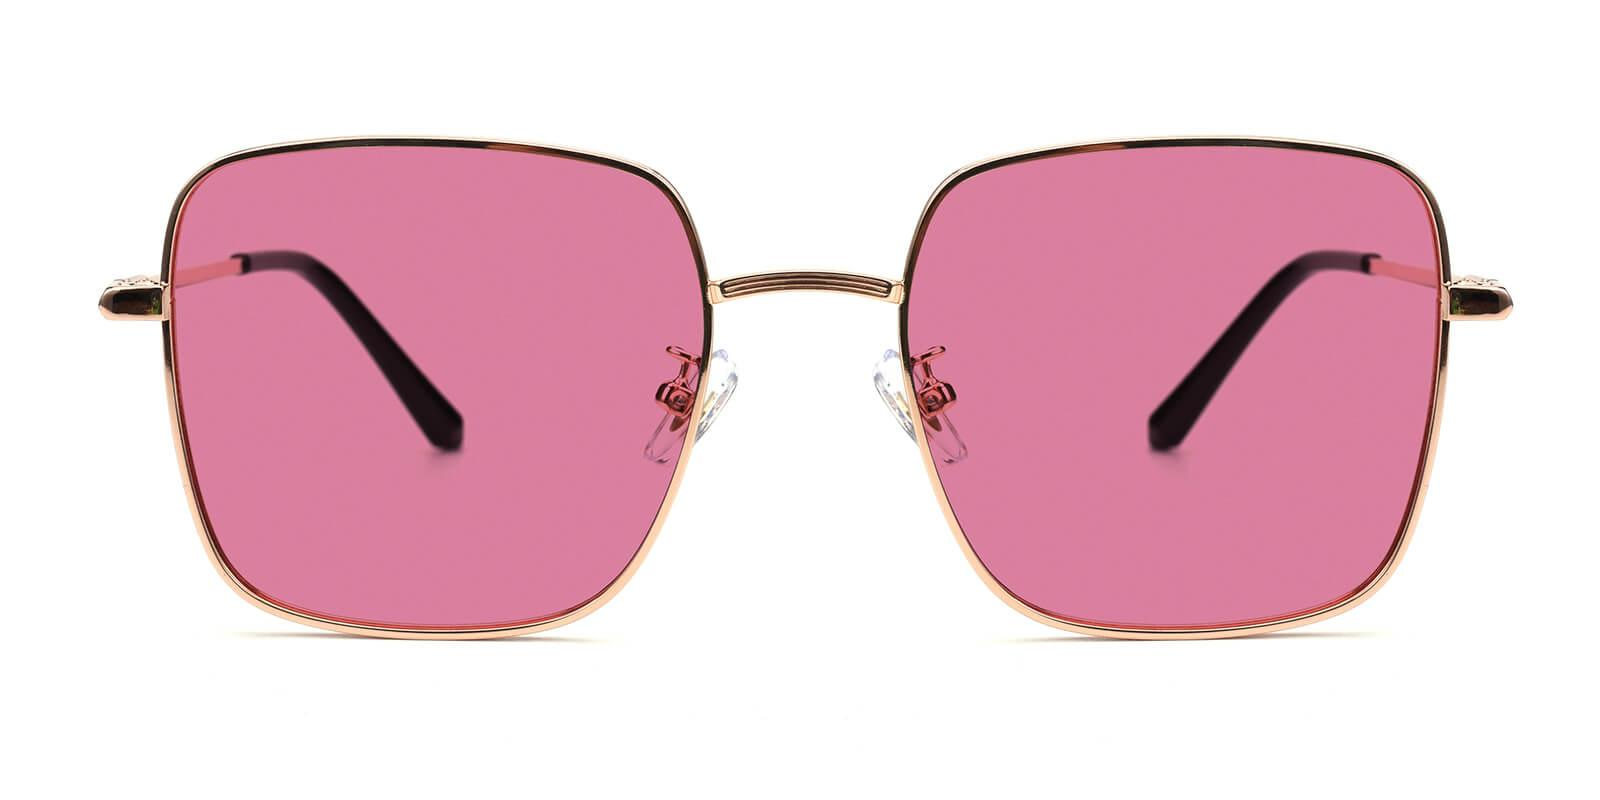 Noun-Gold-Square-Metal-Sunglasses-additional2